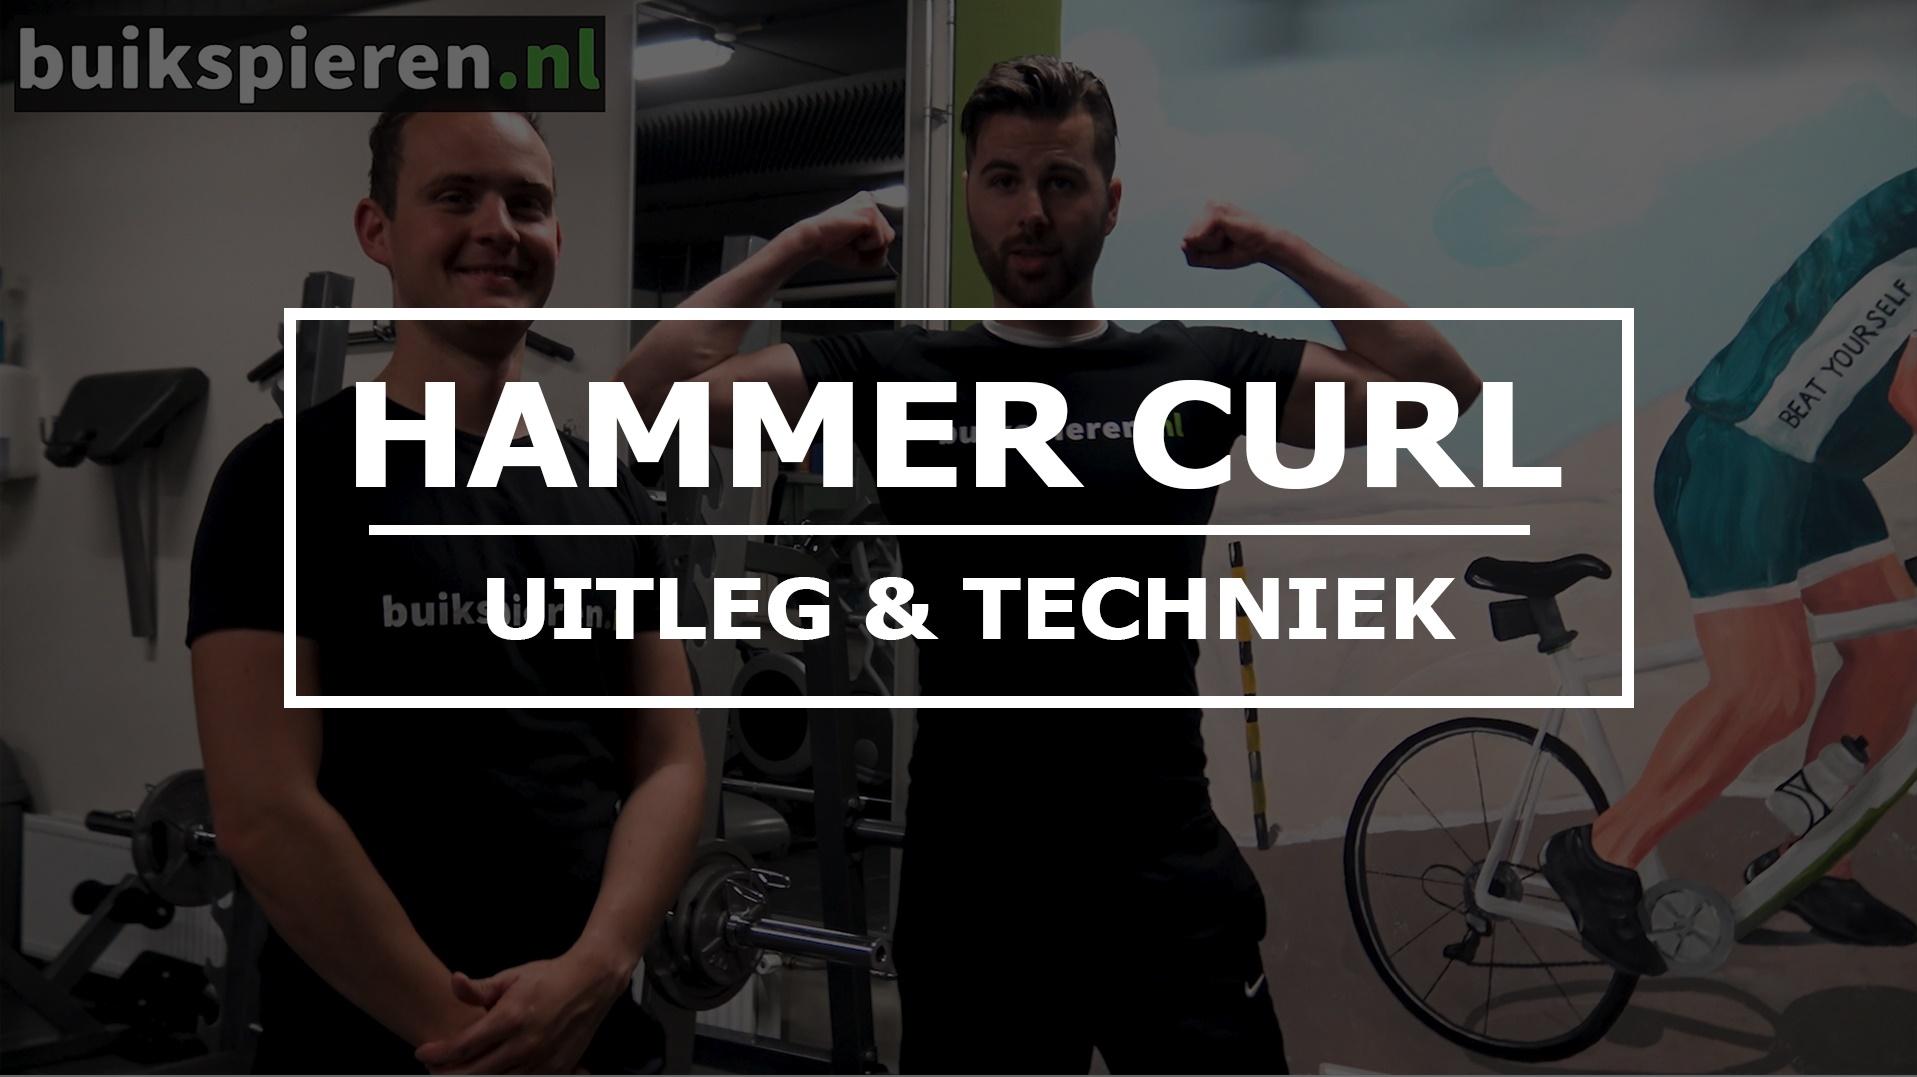 Buikspieren.nl Hammer Curl